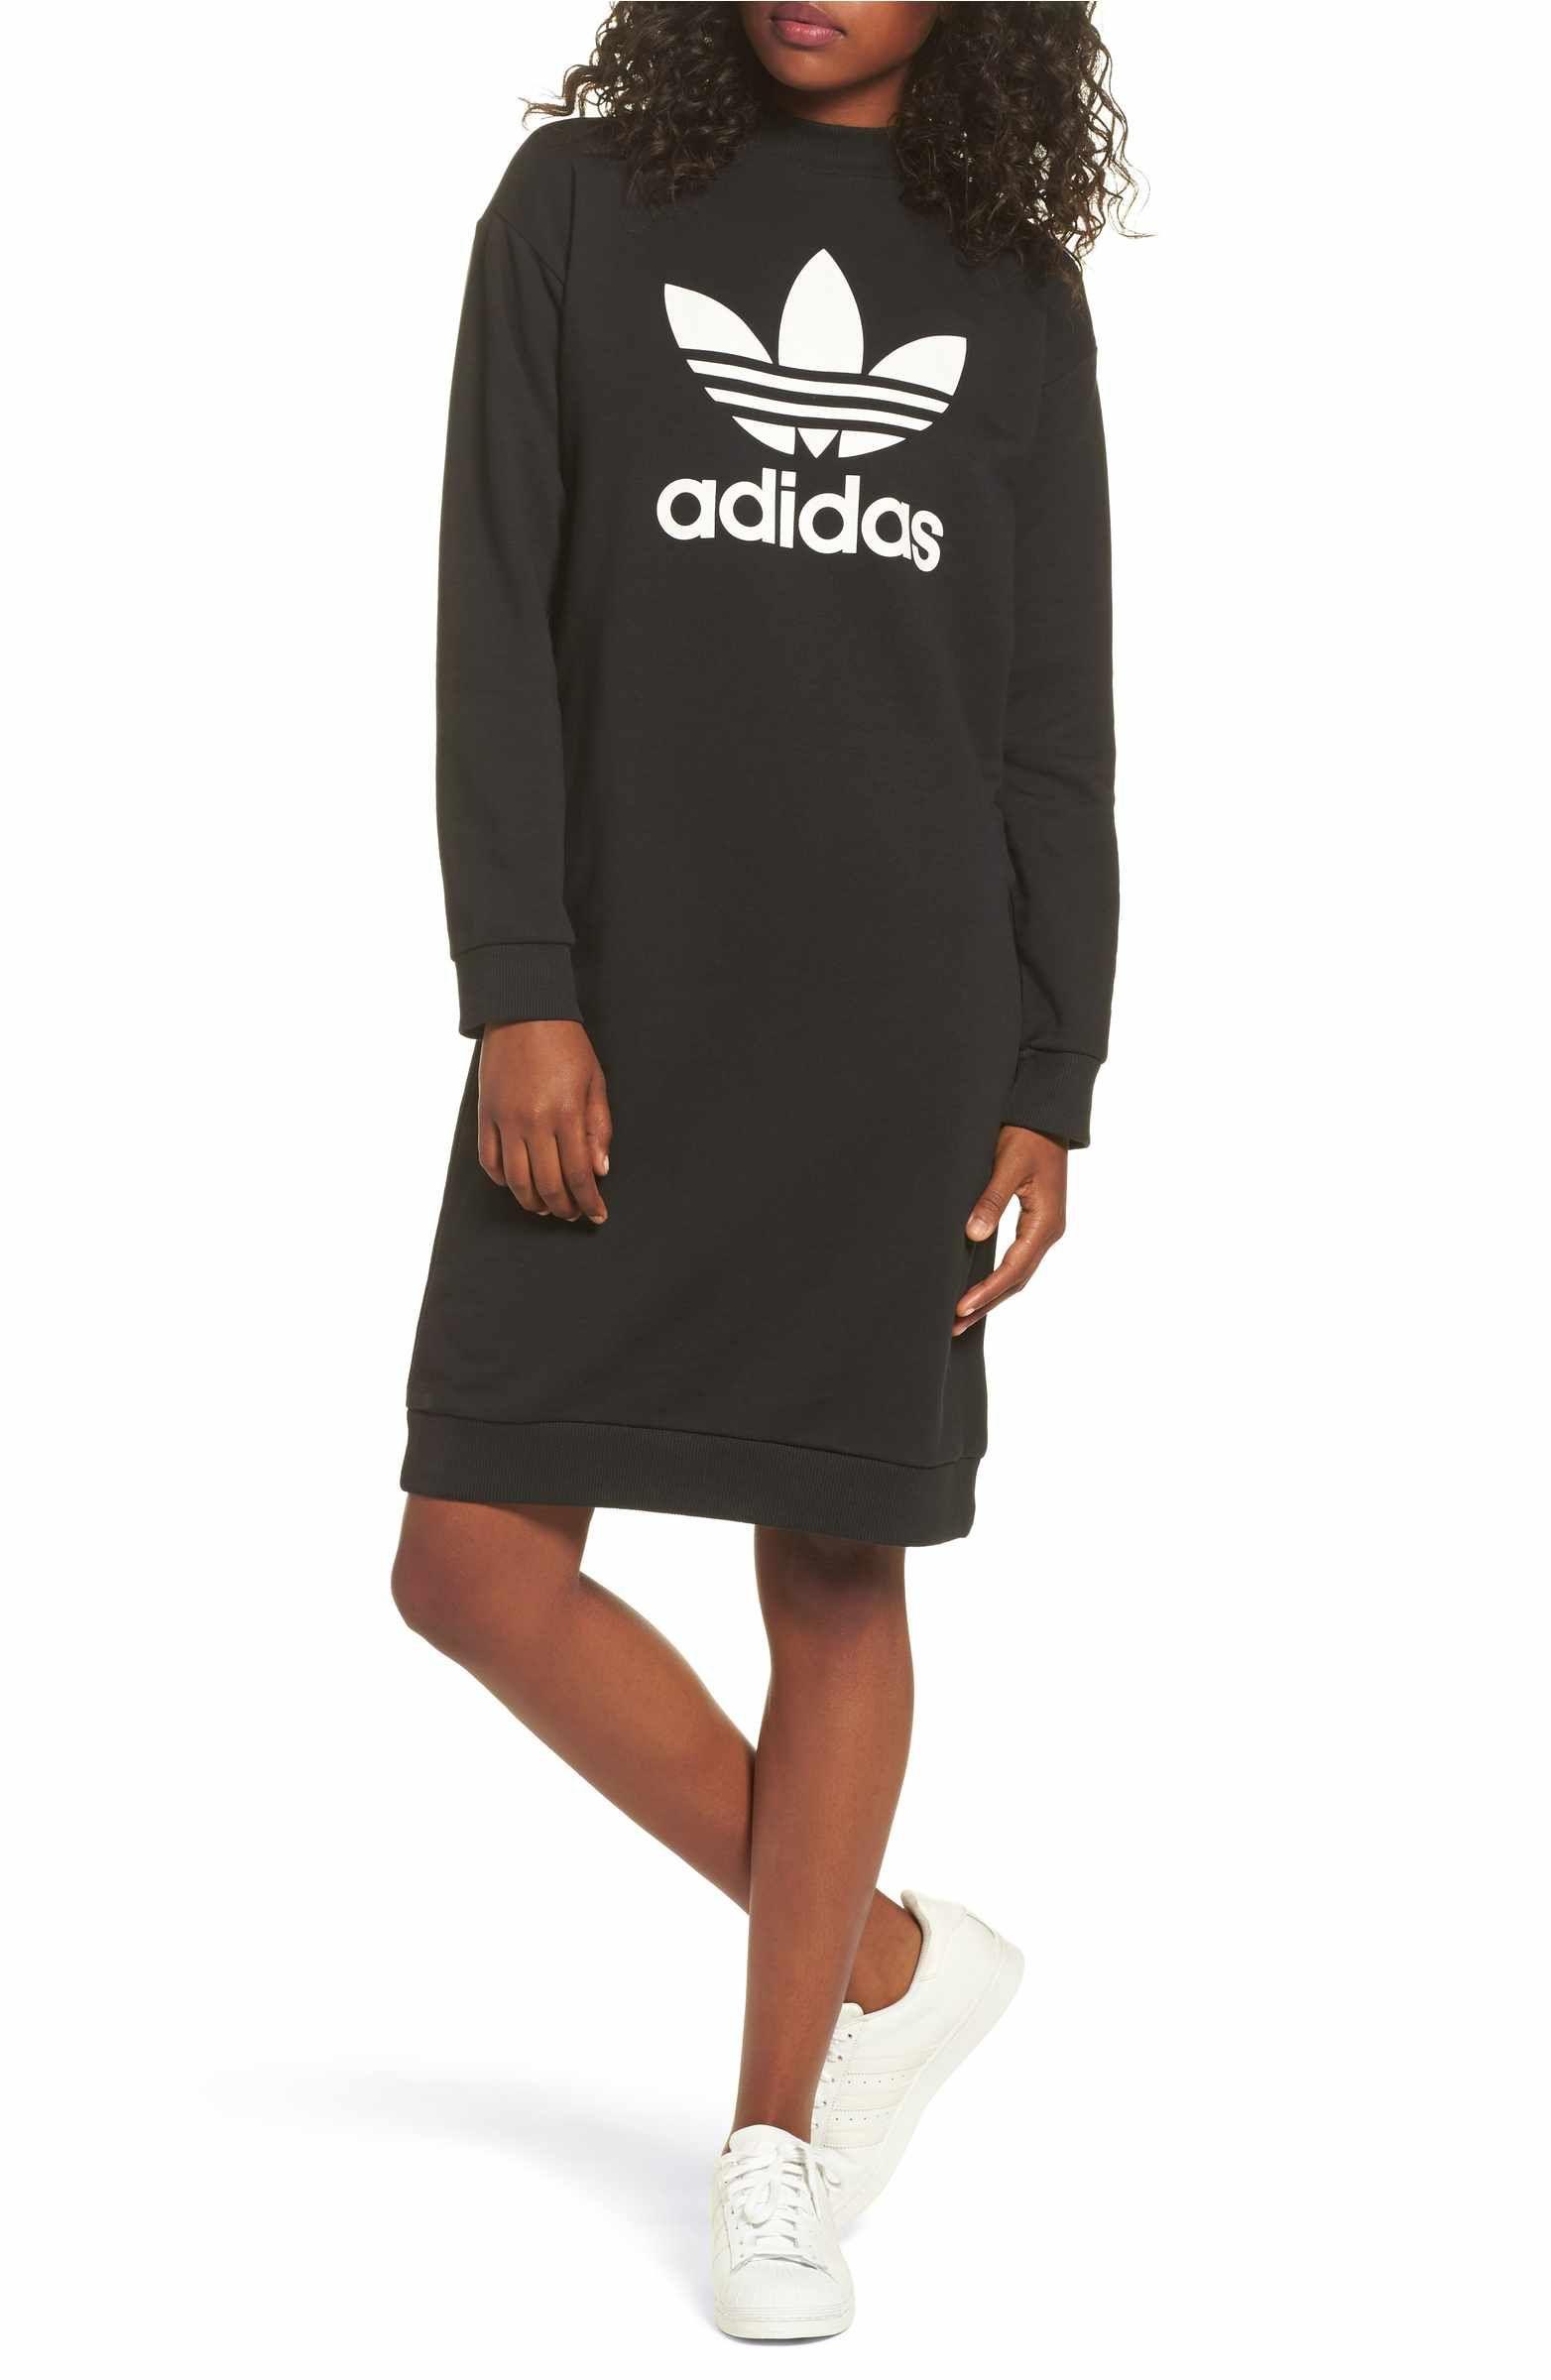 Adidas Trefoil French Terry Crewneck Dress Nordstrom Crewneck Dress Adidas Adidas Originals Women [ 2400 x 1564 Pixel ]